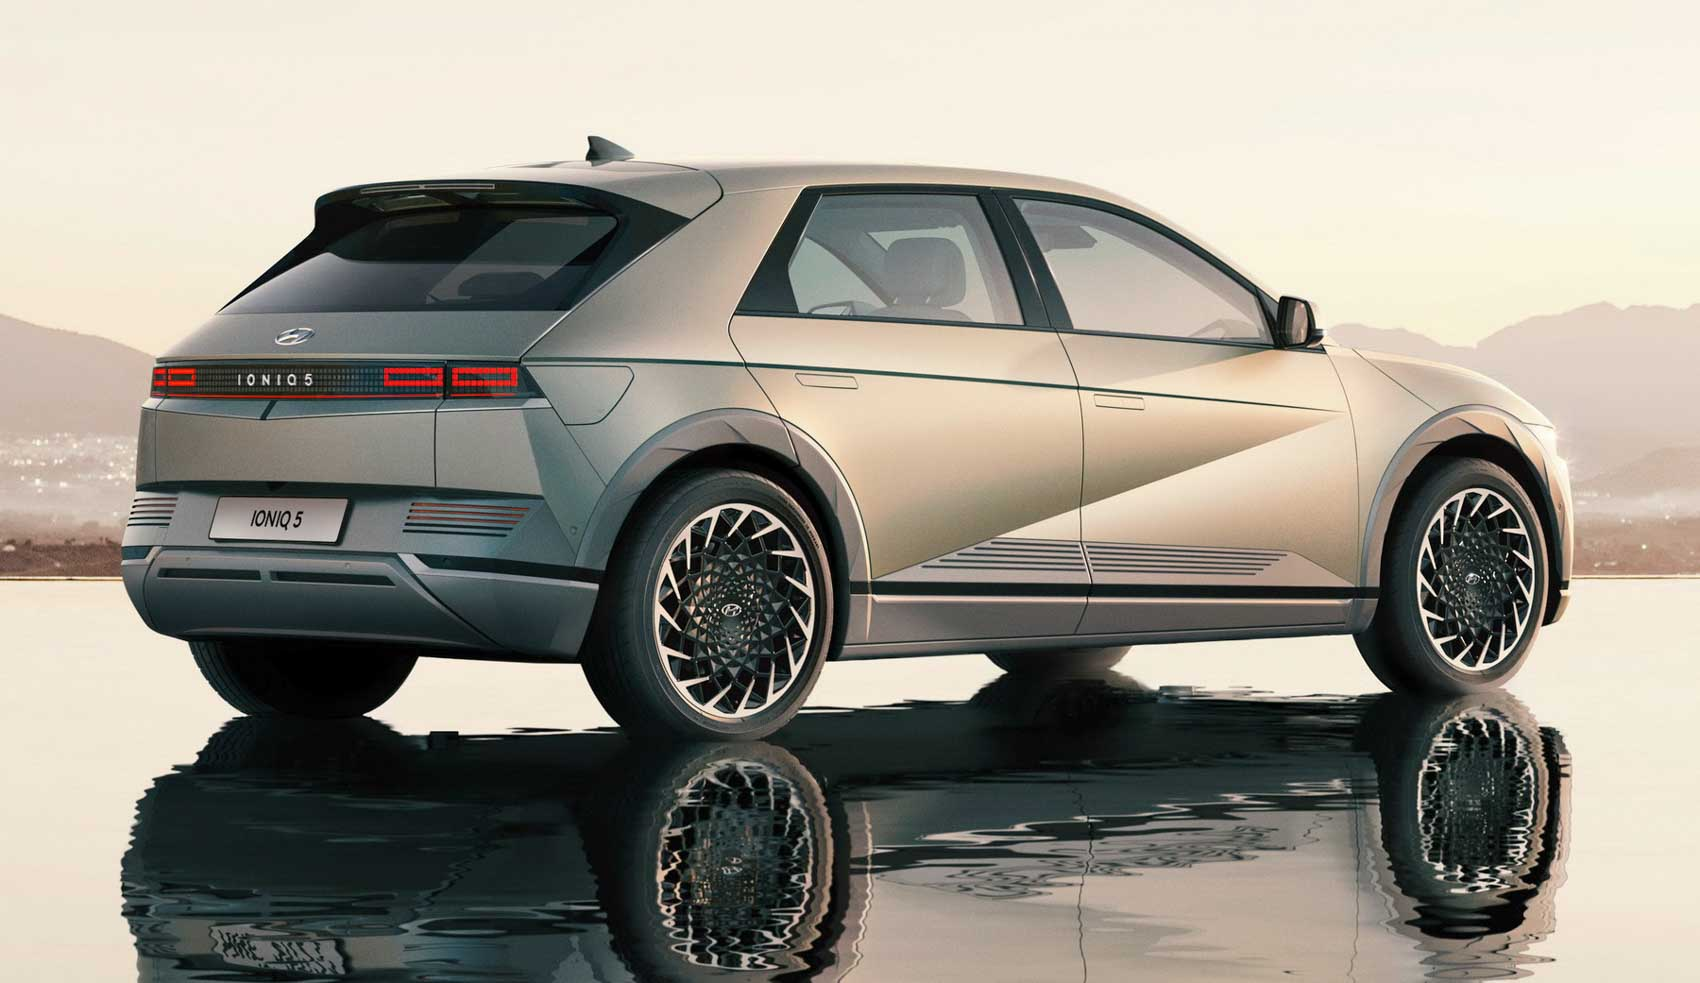 Hyundai Ioniq 5 Unveiled With Nearly 500 Km Range; 0-100 In 5.2 Seconds - GaadiWaadi.com